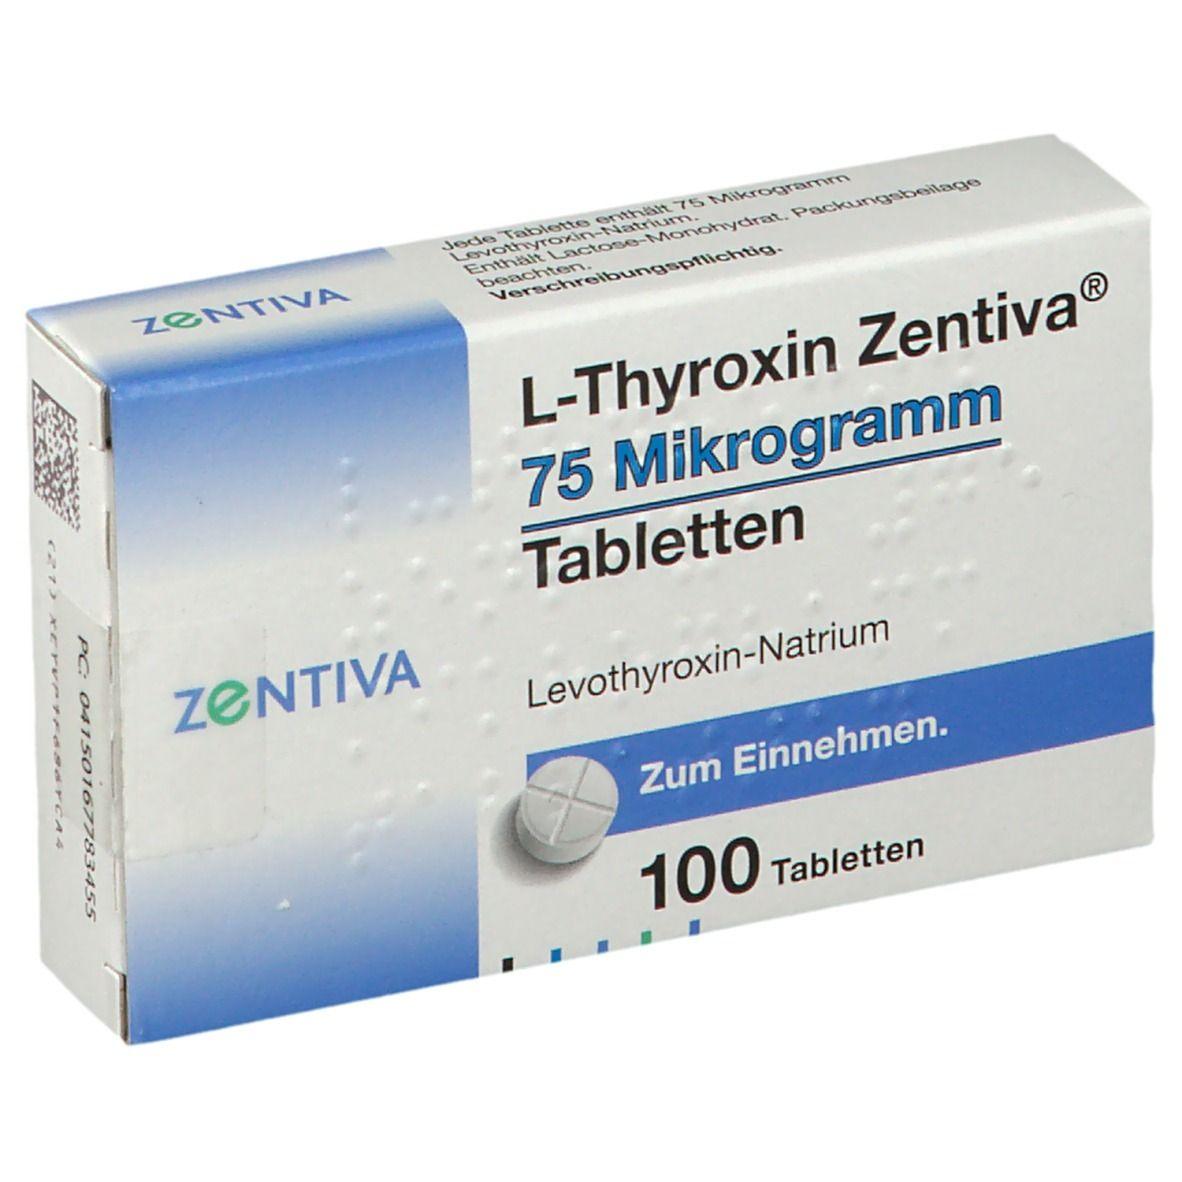 L thyroxin wechselwirkung mit anderen medikamenten